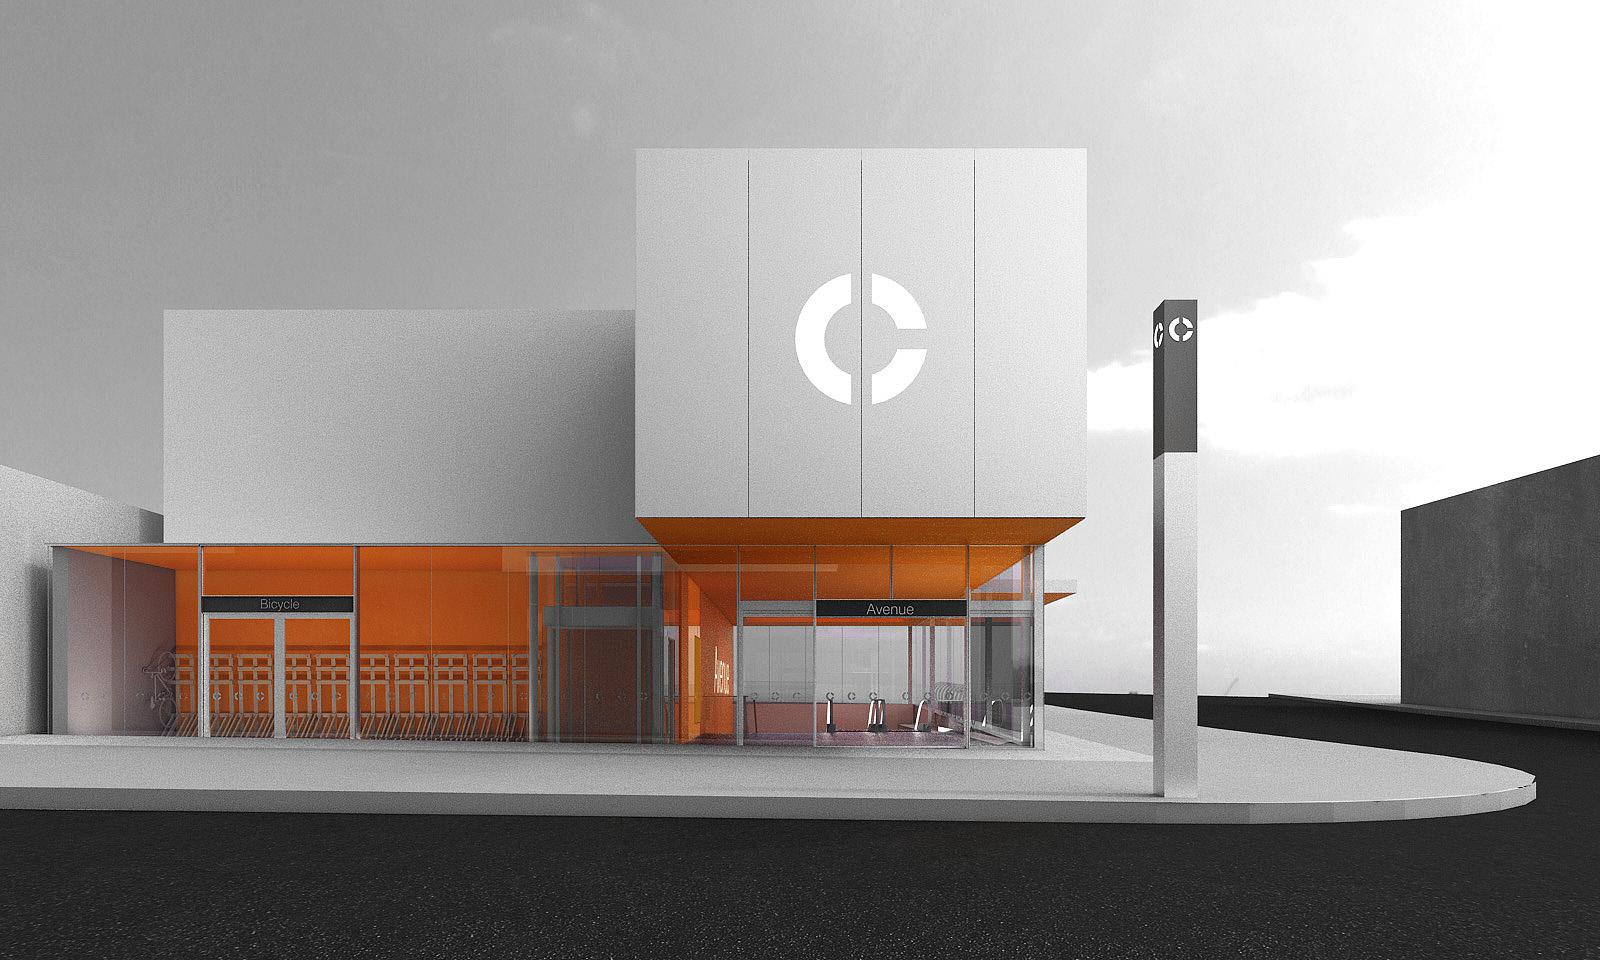 Eglinton Crosstown LRT DX - Avenue Station Primary Entrance Fron